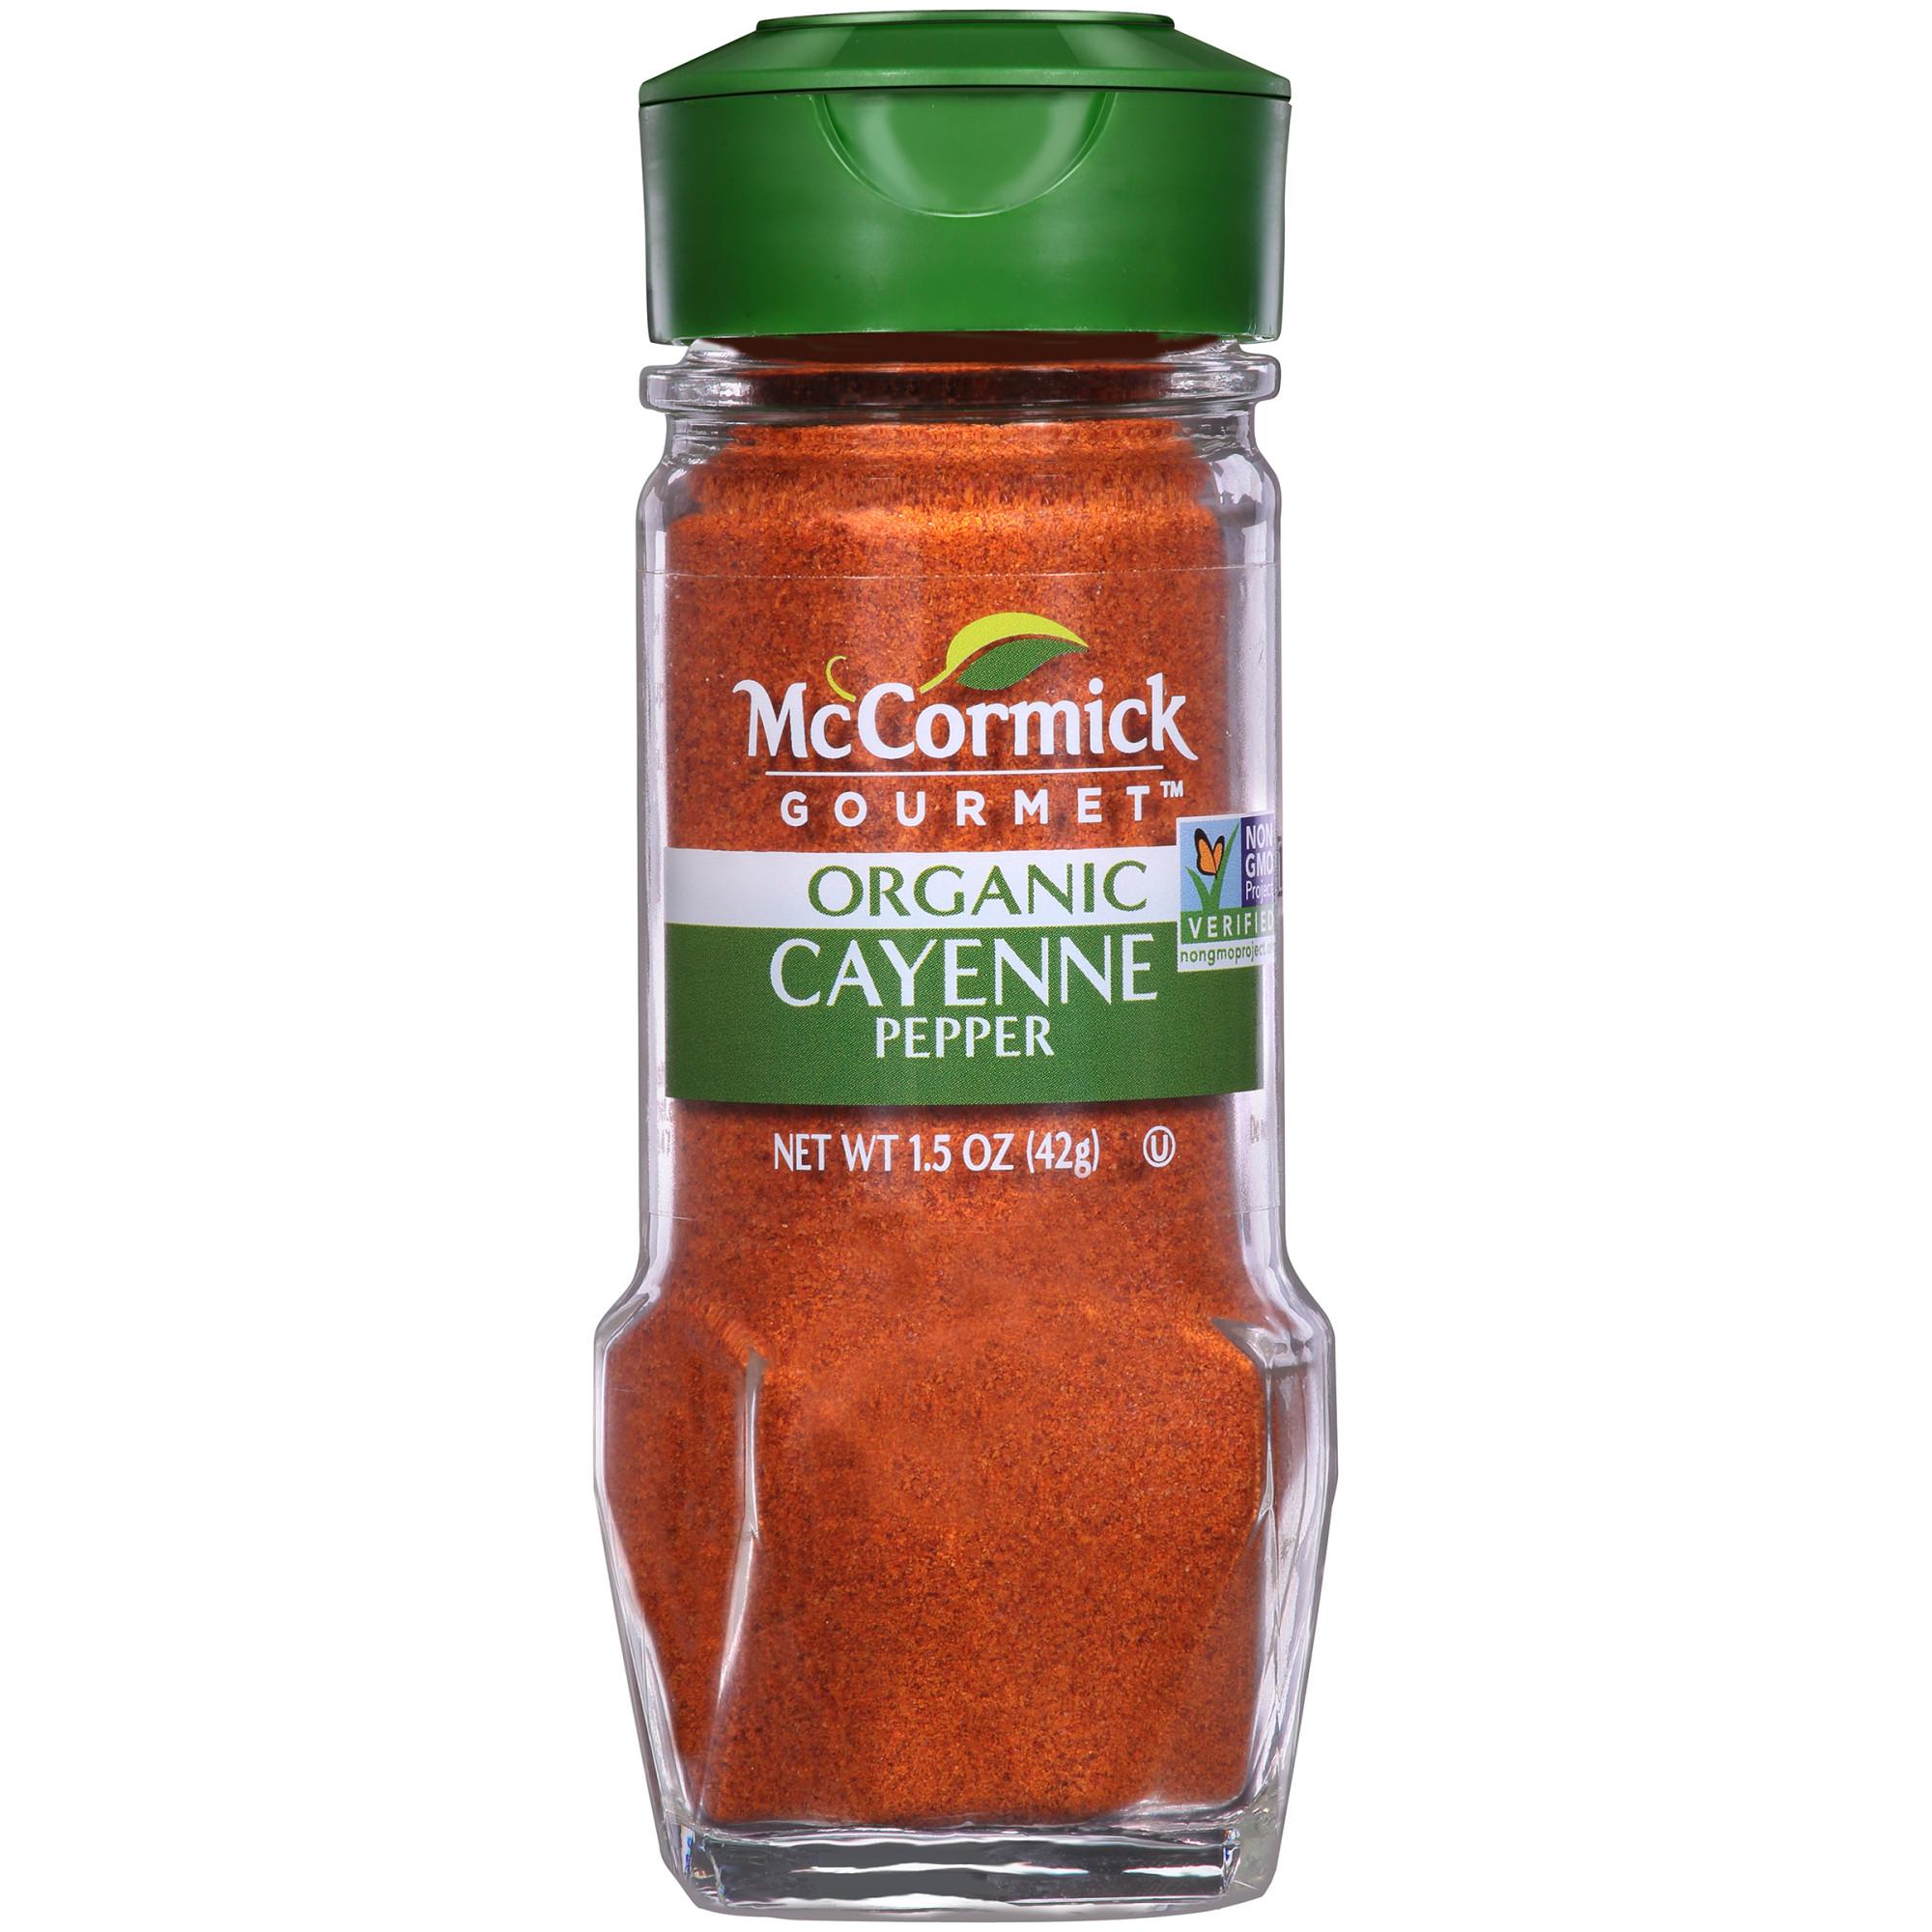 McCormick Gourmet Organic Cayenne Red Pepper, 1.5 oz